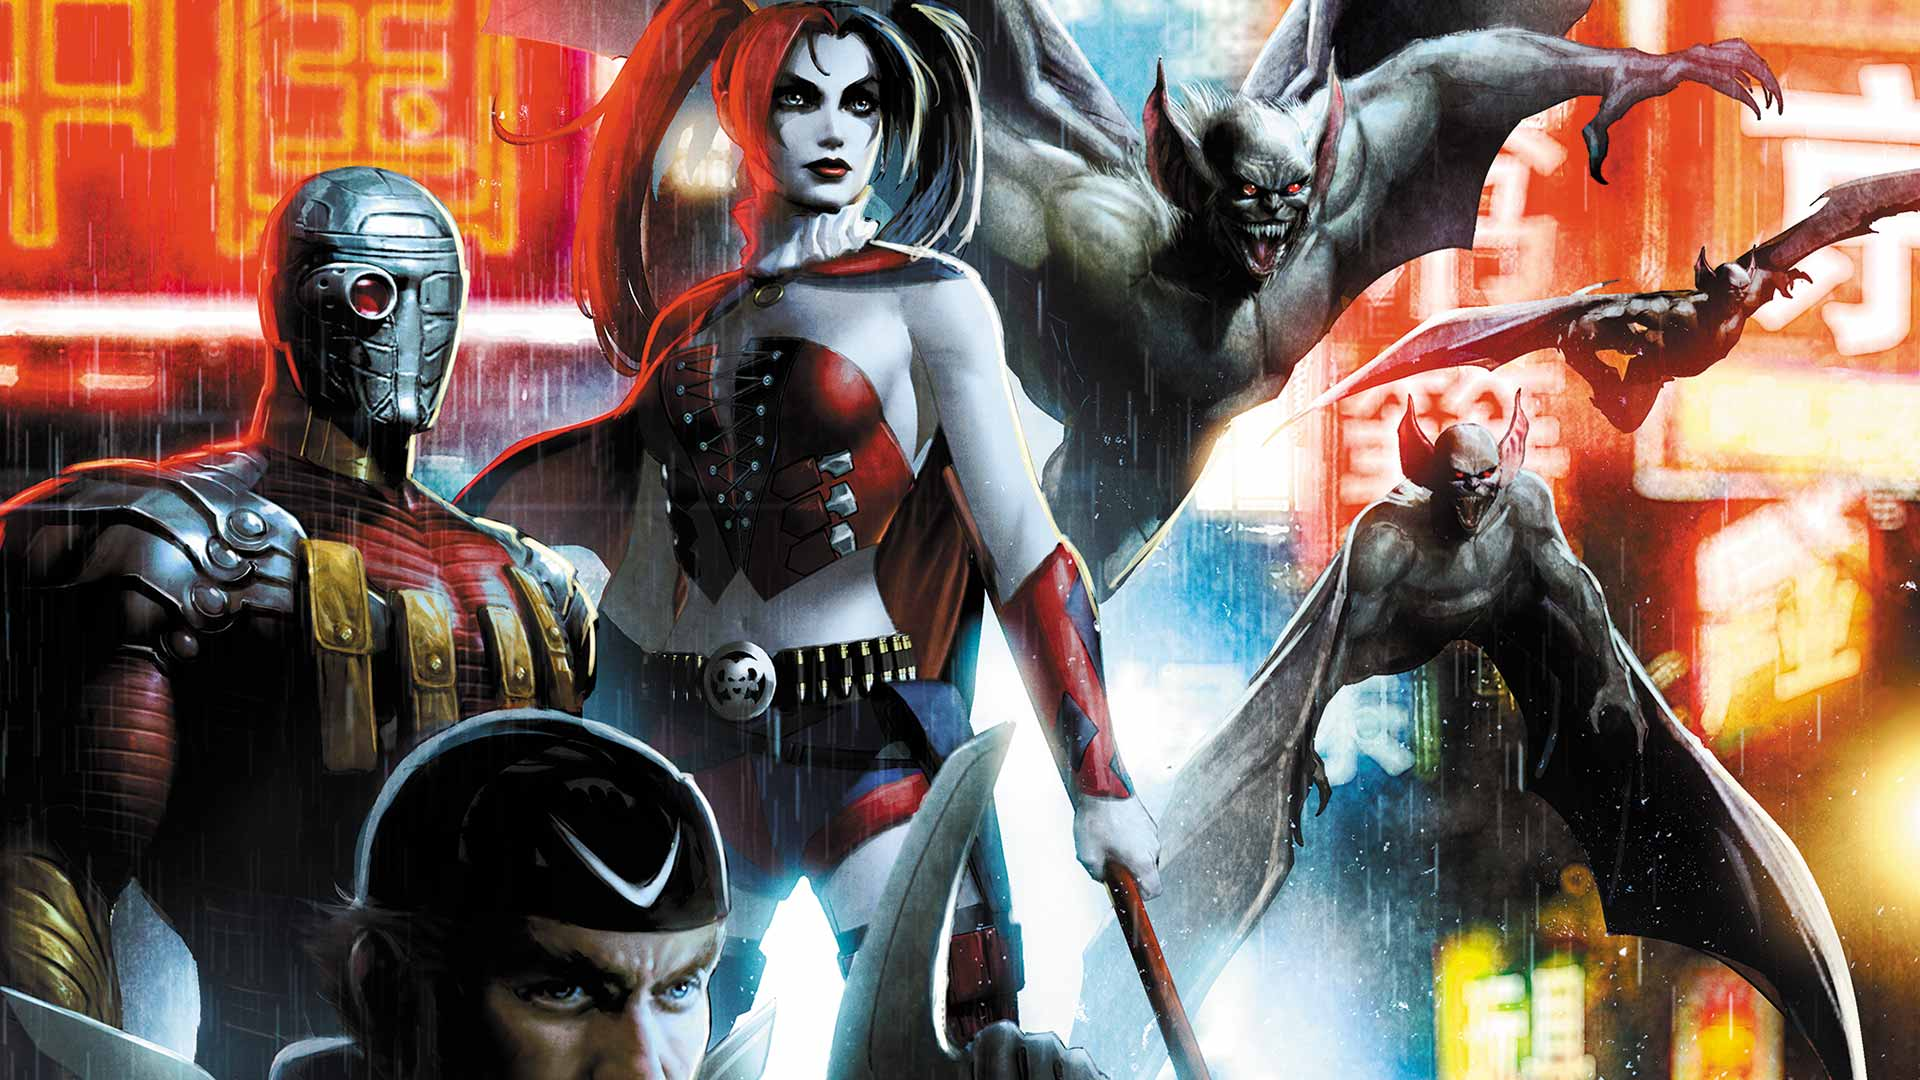 Suicide Squad Movie Wallpaper